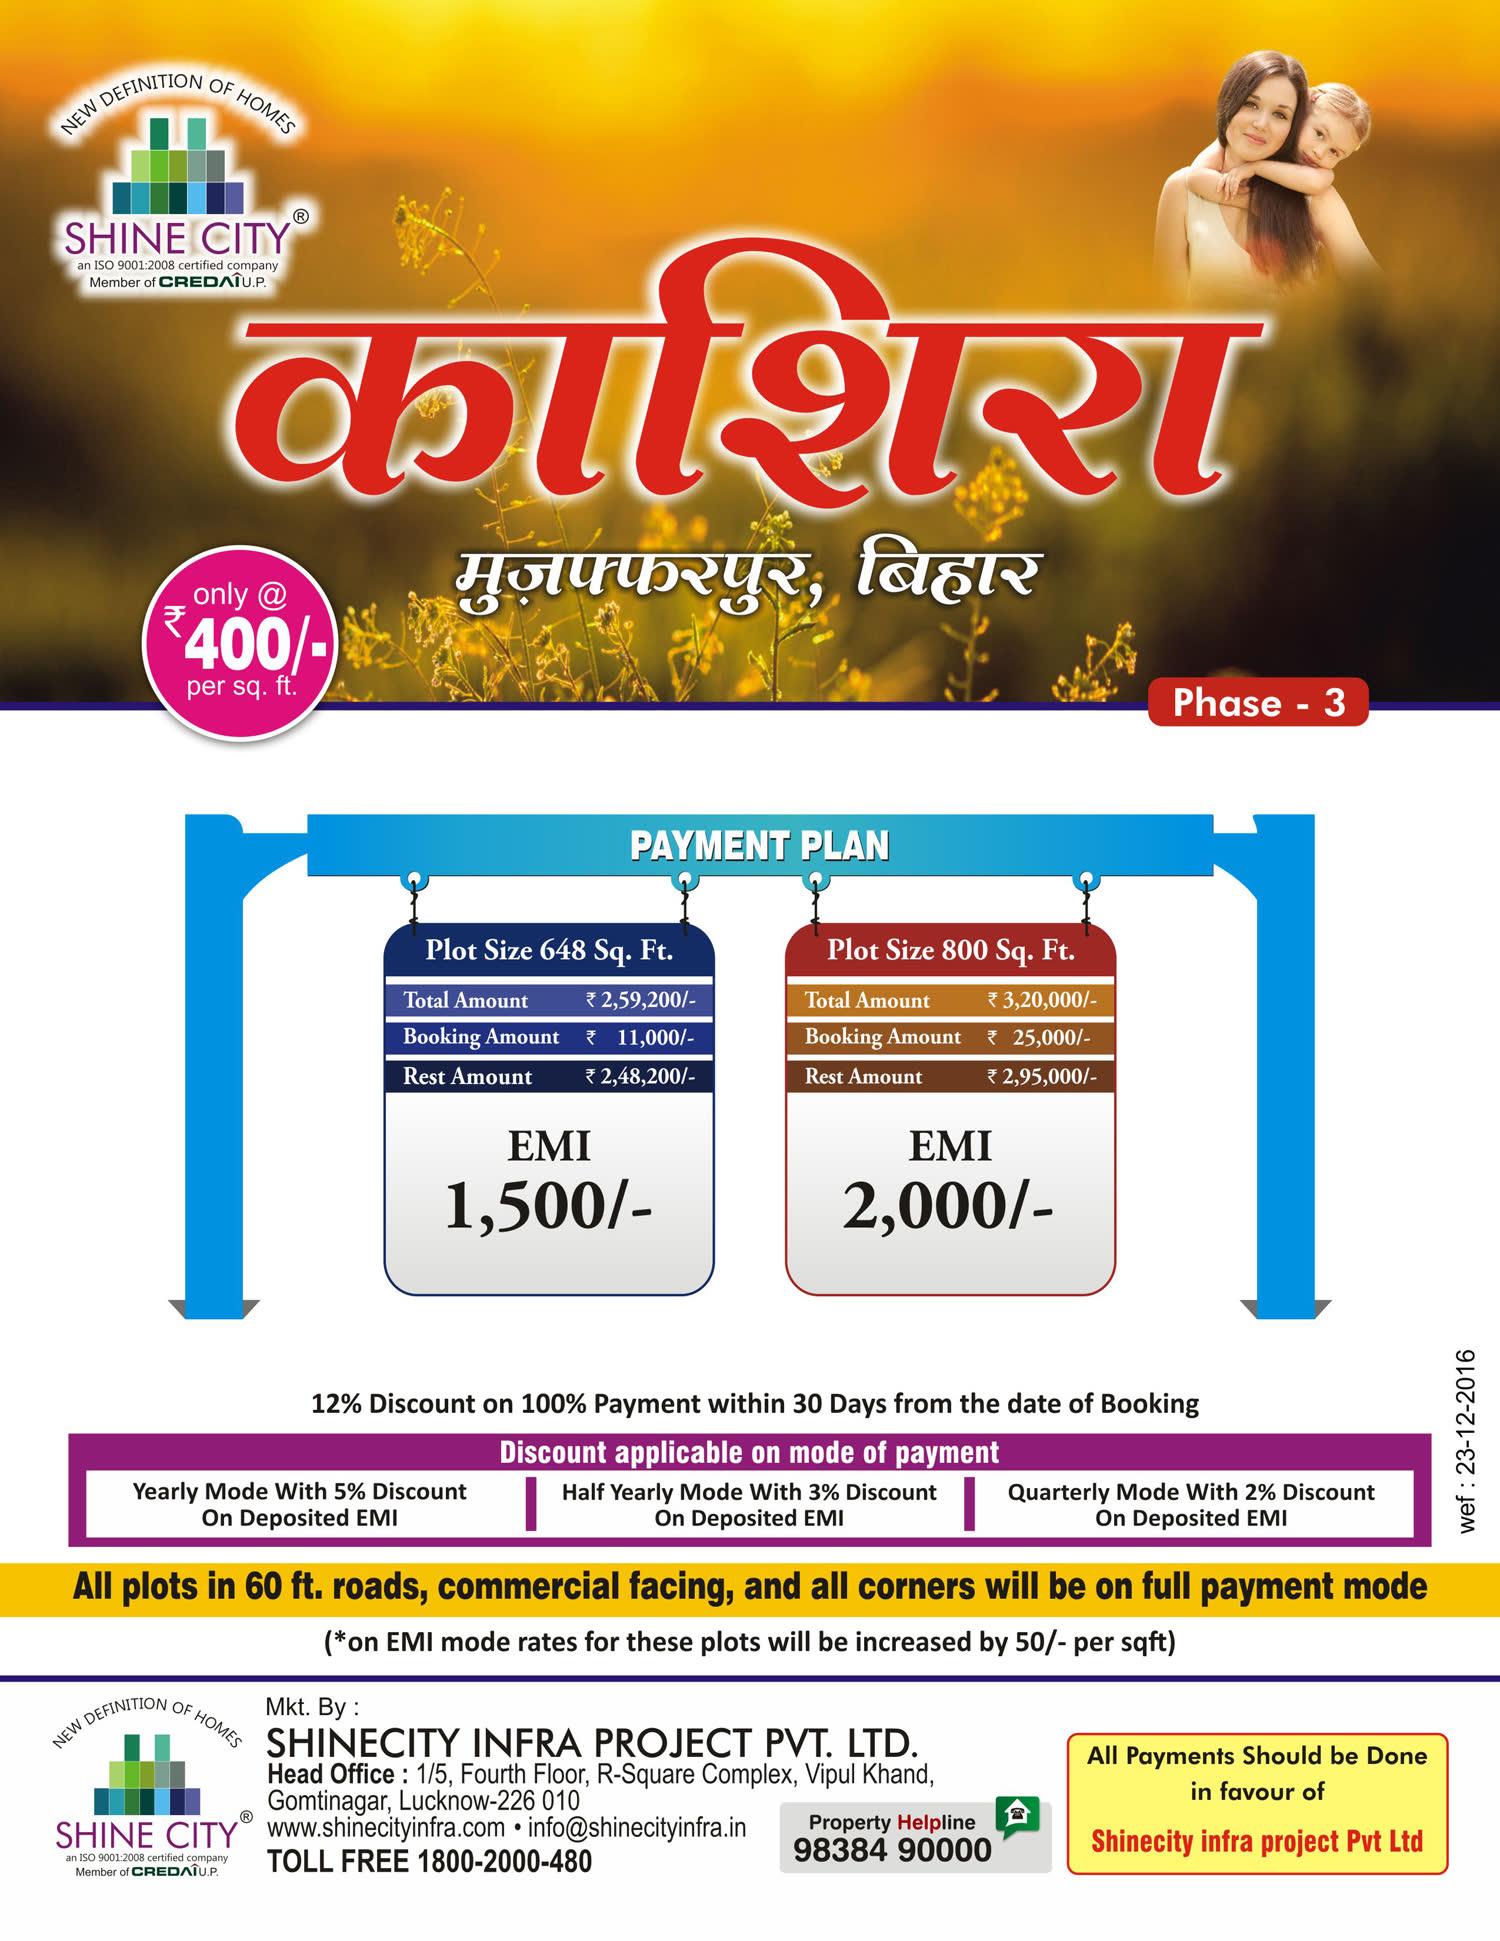 Kazi Inda Chaok-3 Km,mahua Road, Muzafferpur Me Residential Plot Book Kare, ( Plot Size-800 Sq.ft., Booking Amount Only Rs - 2000--), (plot Size -648 Sq.ft.., Booking Amount Only Rs-1500--) Rest Amount For Emi Plan 0 Percent Byaj